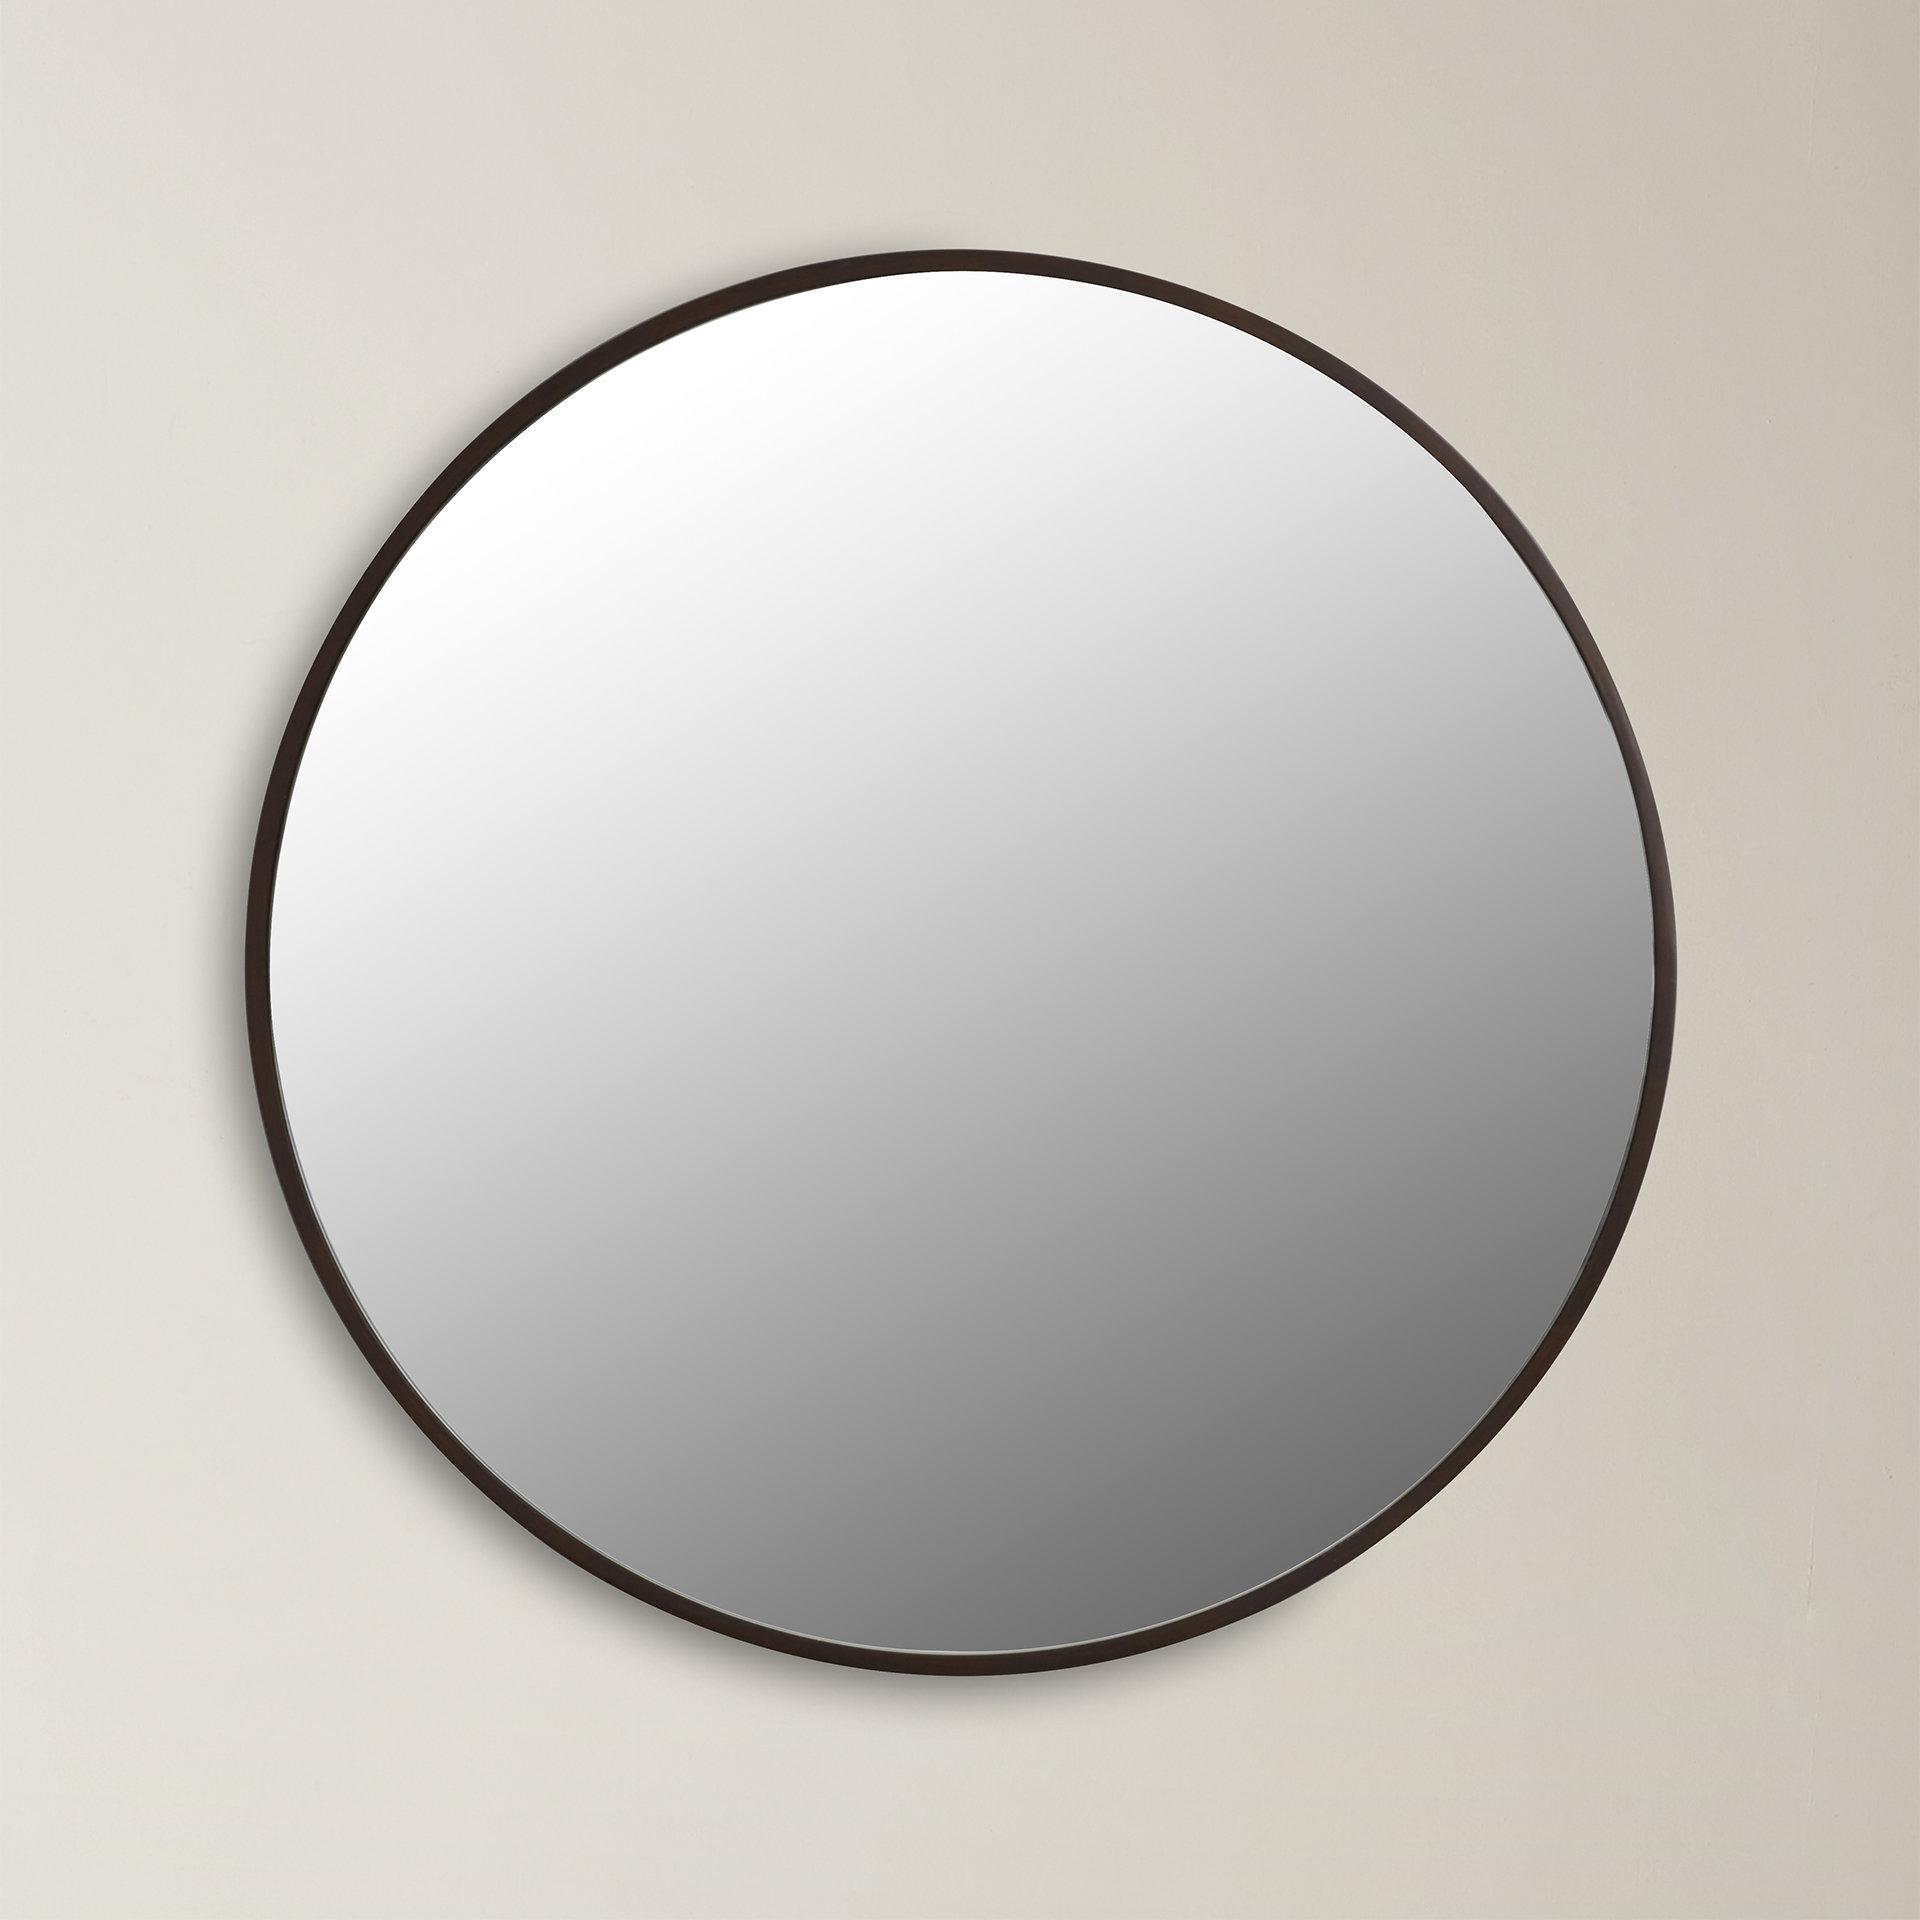 Gaunts Earthcott Modern & Contemporary Beveled Accent Mirrors In 2019 Levan Modern & Contemporary Accent Mirror (View 1 of 20)